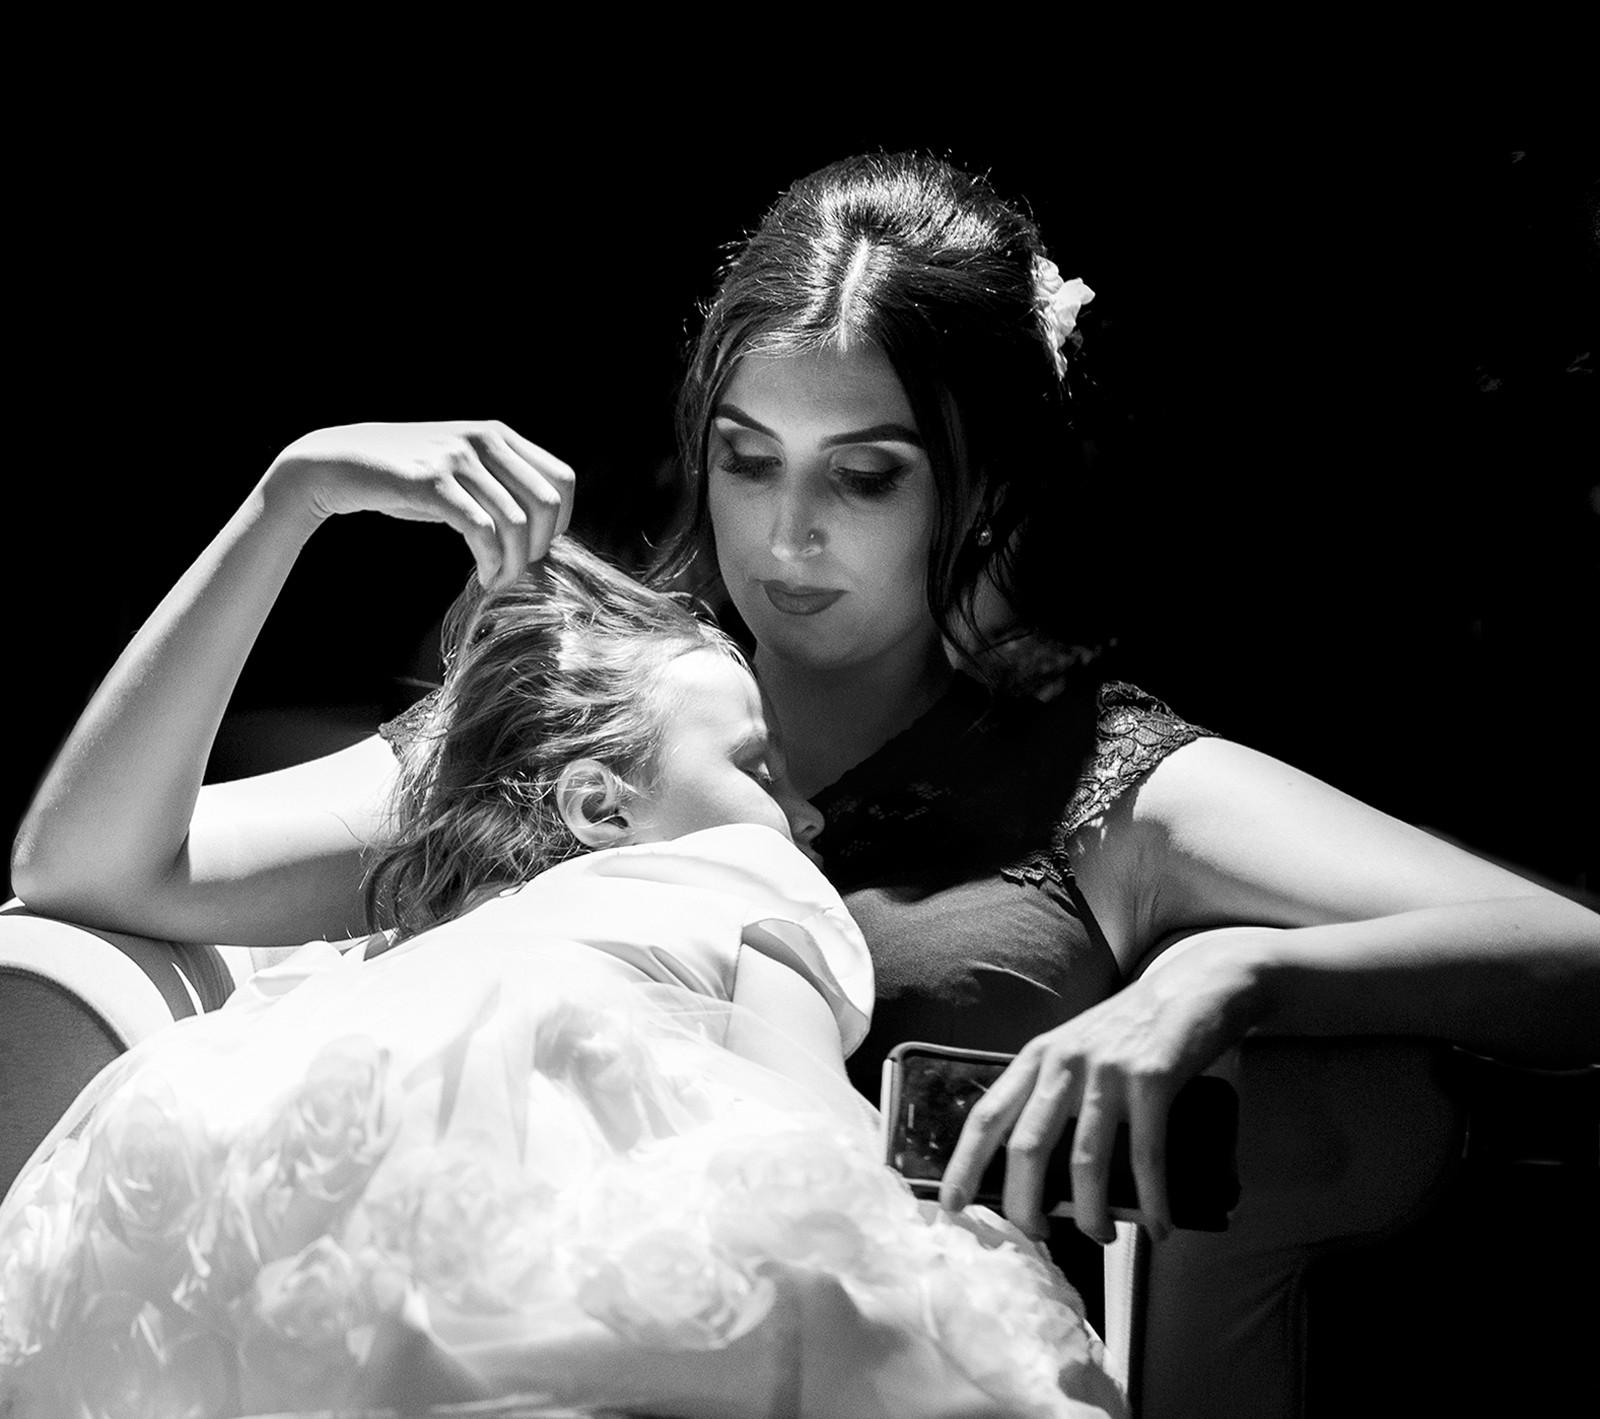 Mother's Love - J Glynn